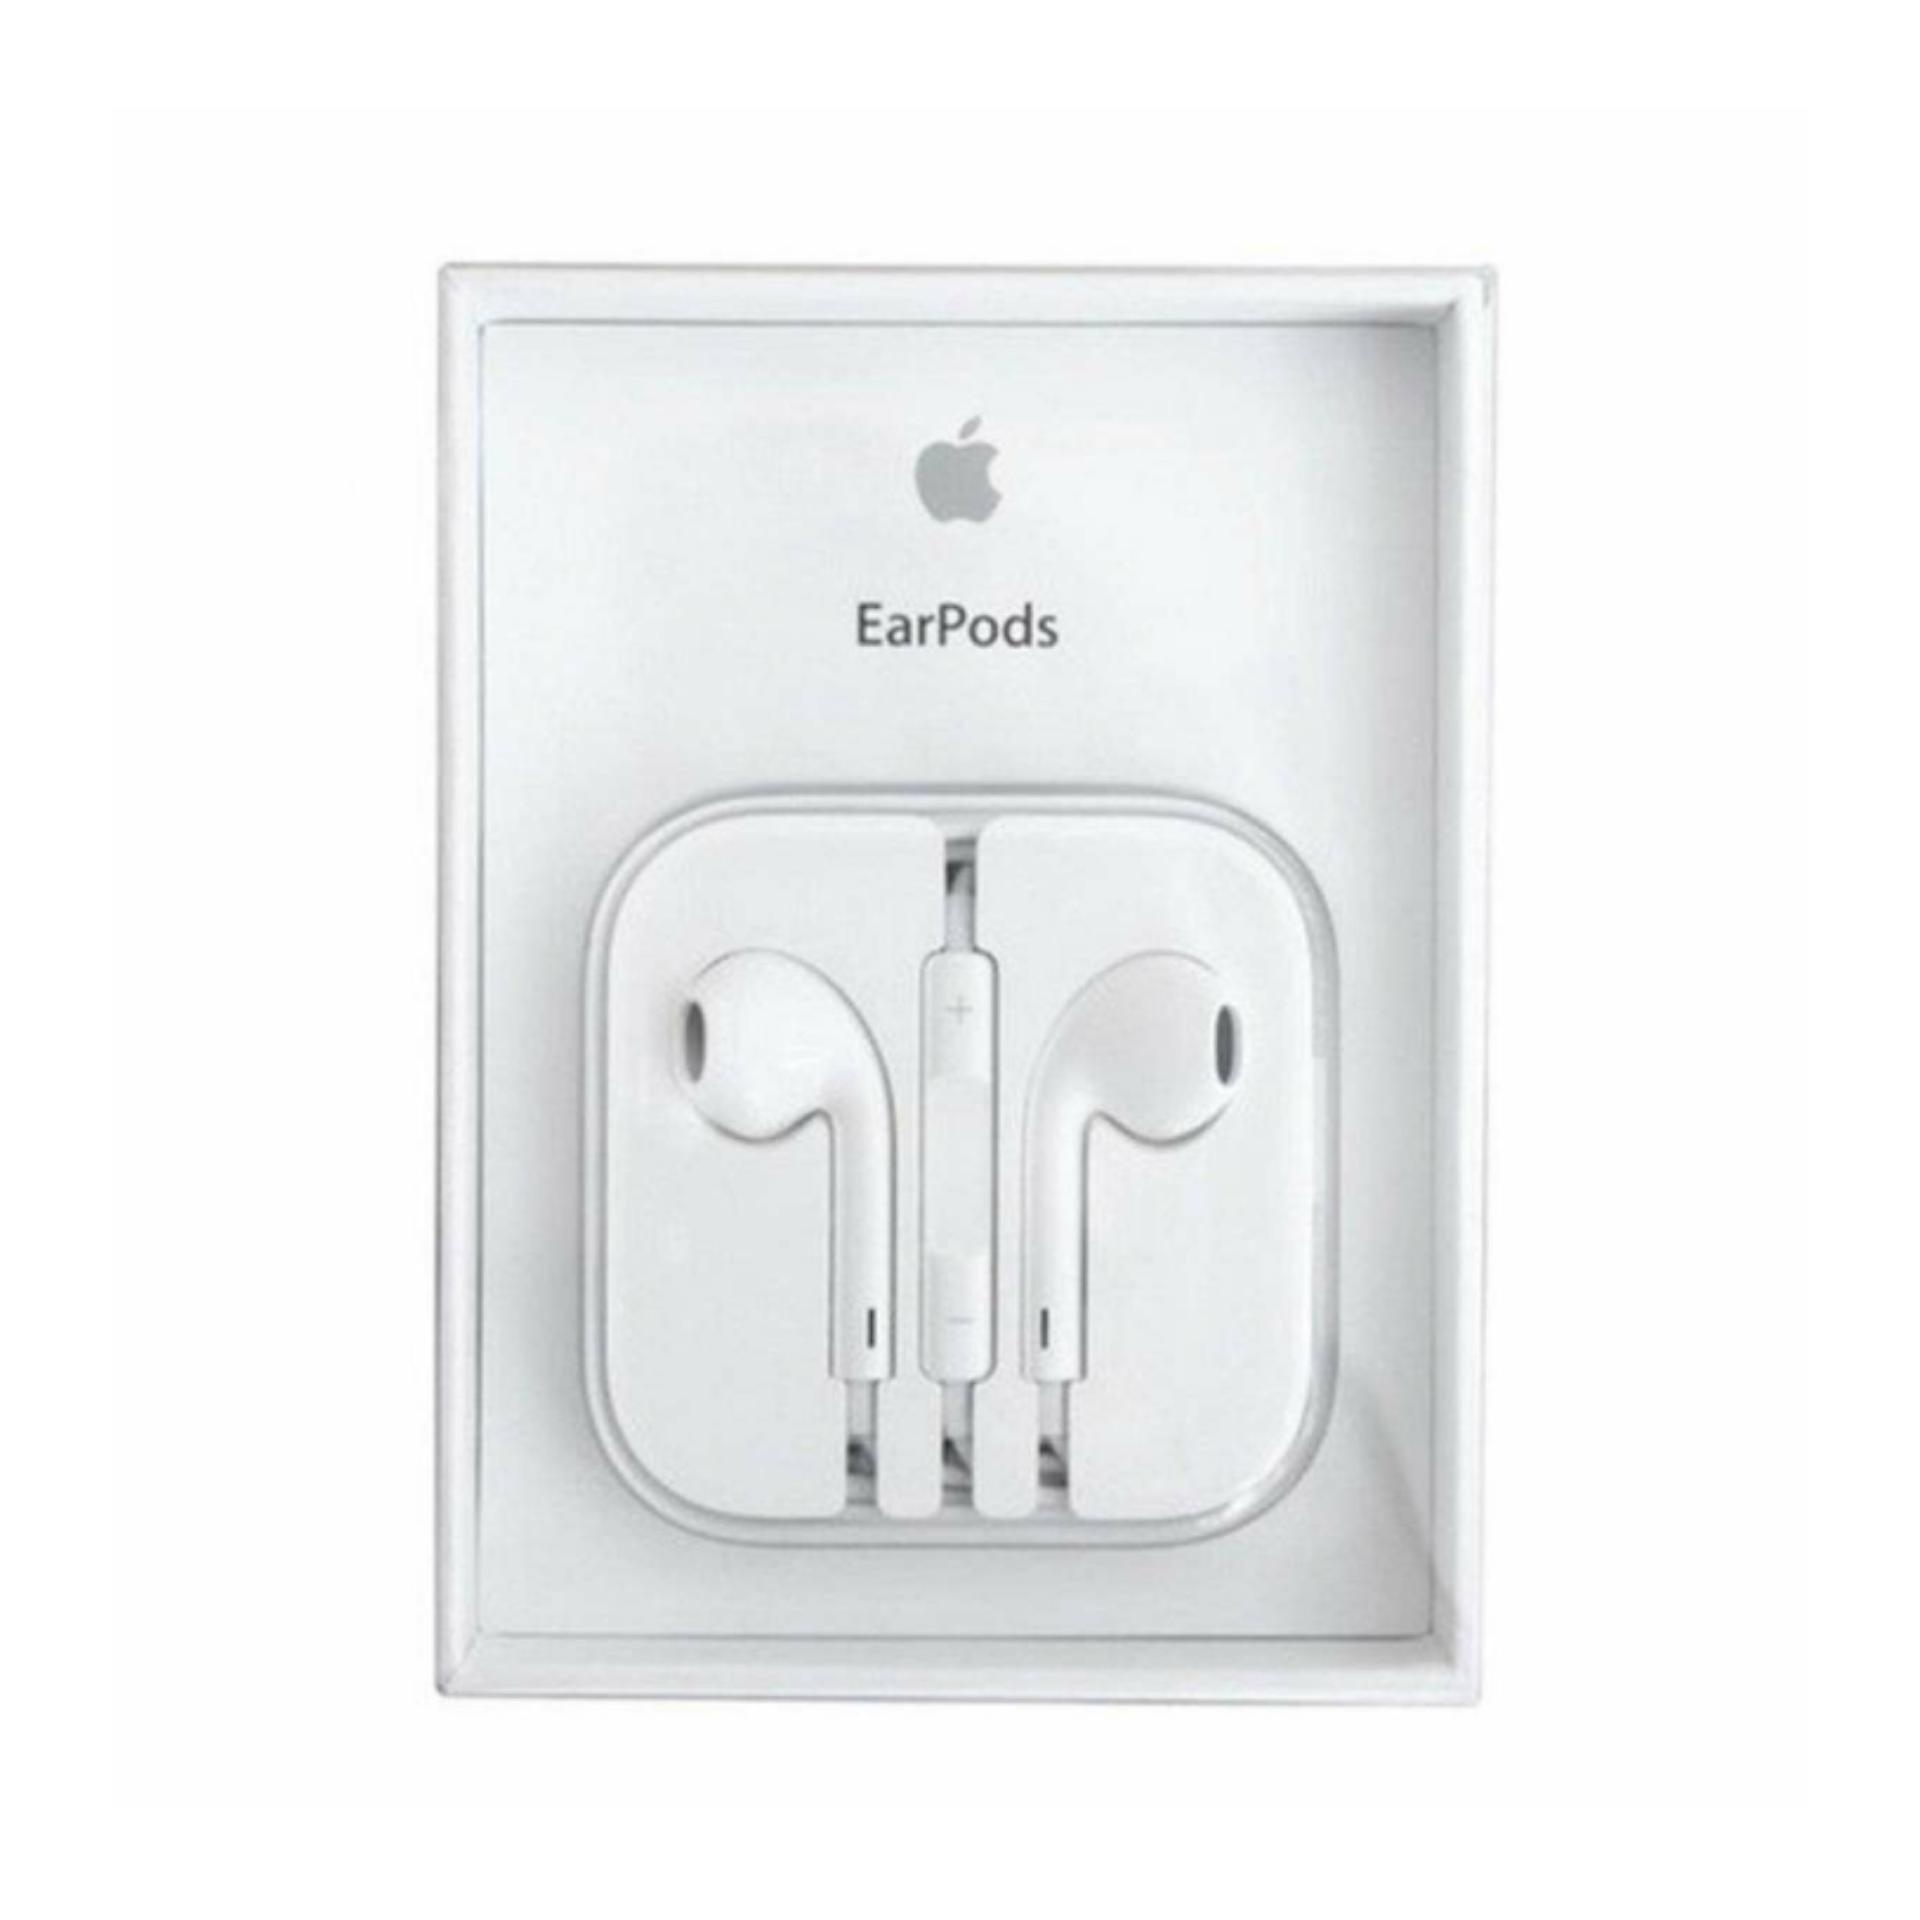 Kelebihan Apple Oem Earphone For Iphone 5 5s Biru Tua Terkini Earpods Handsfree Rainbow Colours Handset Original 9star 6s Plus Putih